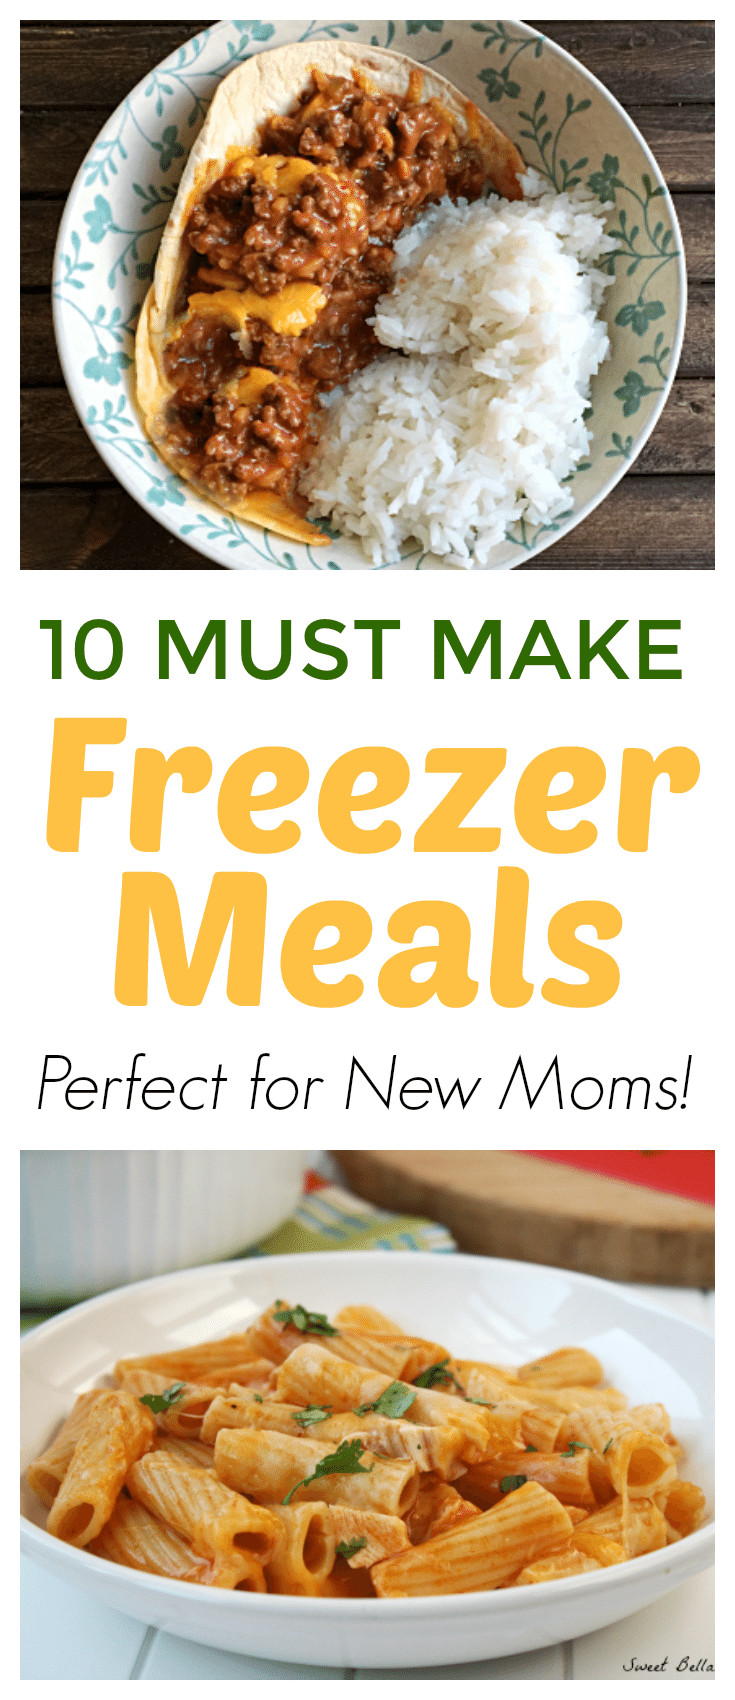 Top Ten Meals For Dinner  Ten Freezer Meals for New Moms Grace and Good Eats